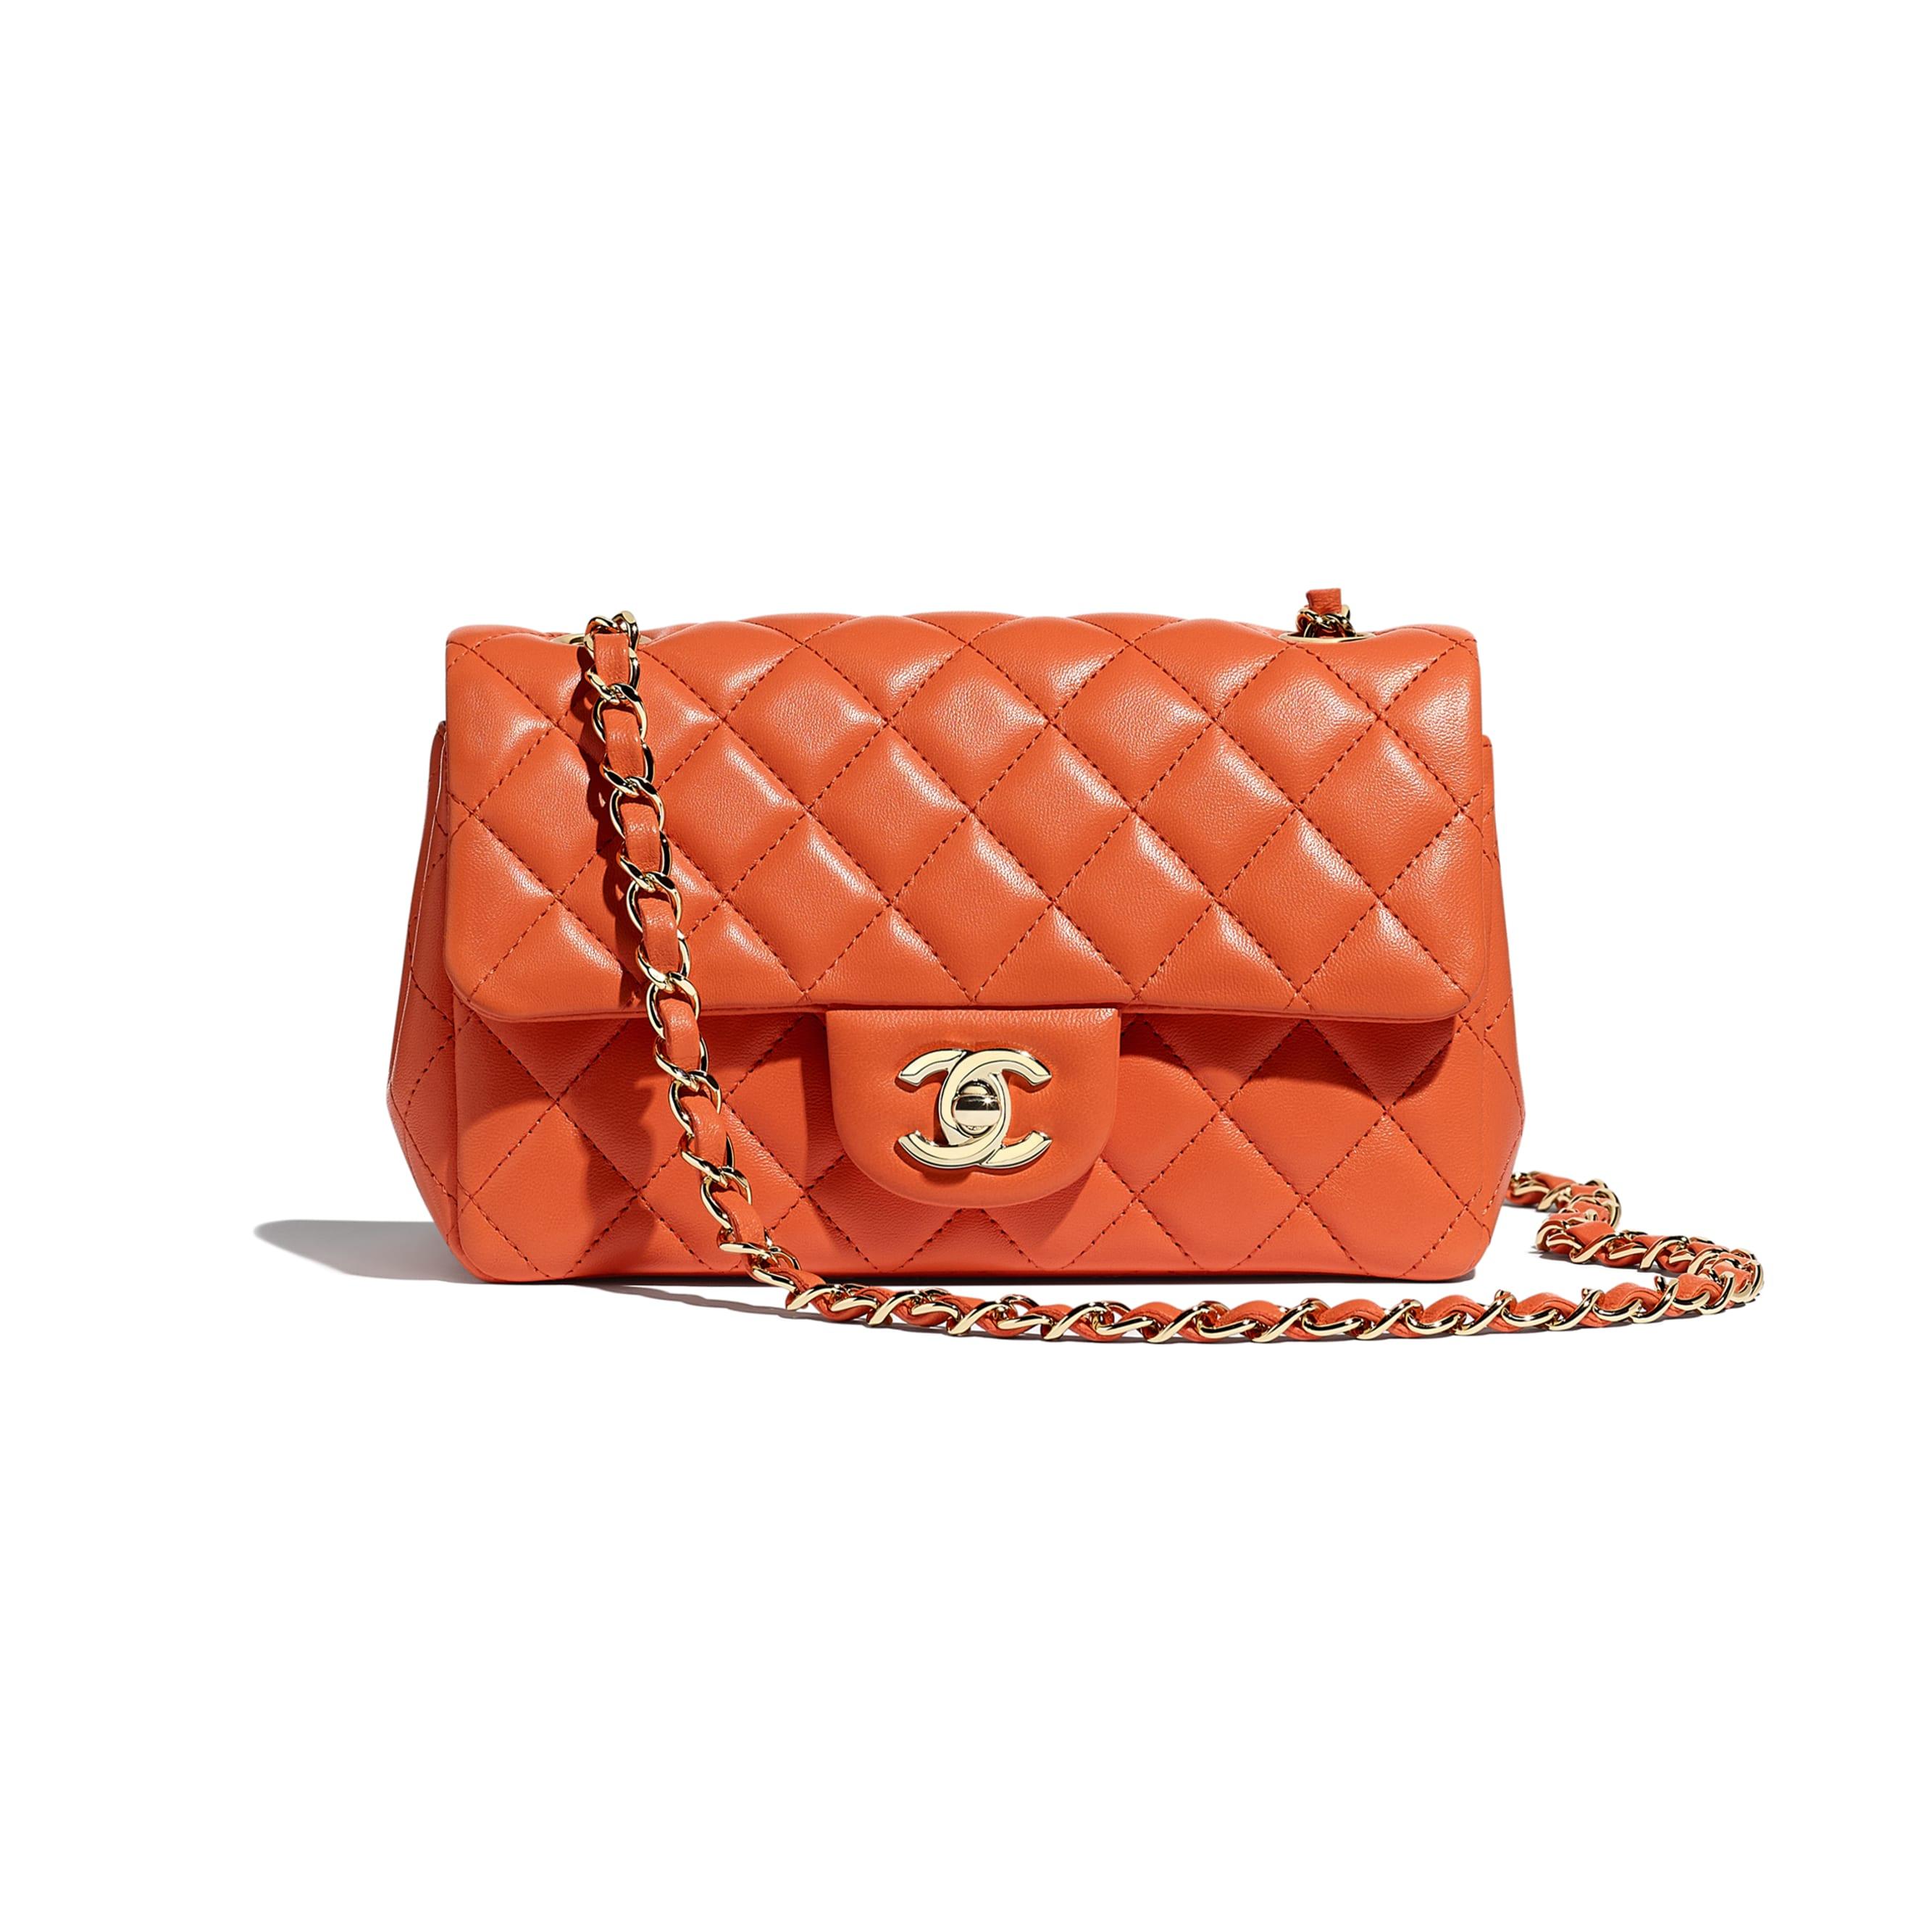 Mini Flap Bag - Orange - Lambskin - CHANEL - Default view - see standard sized version